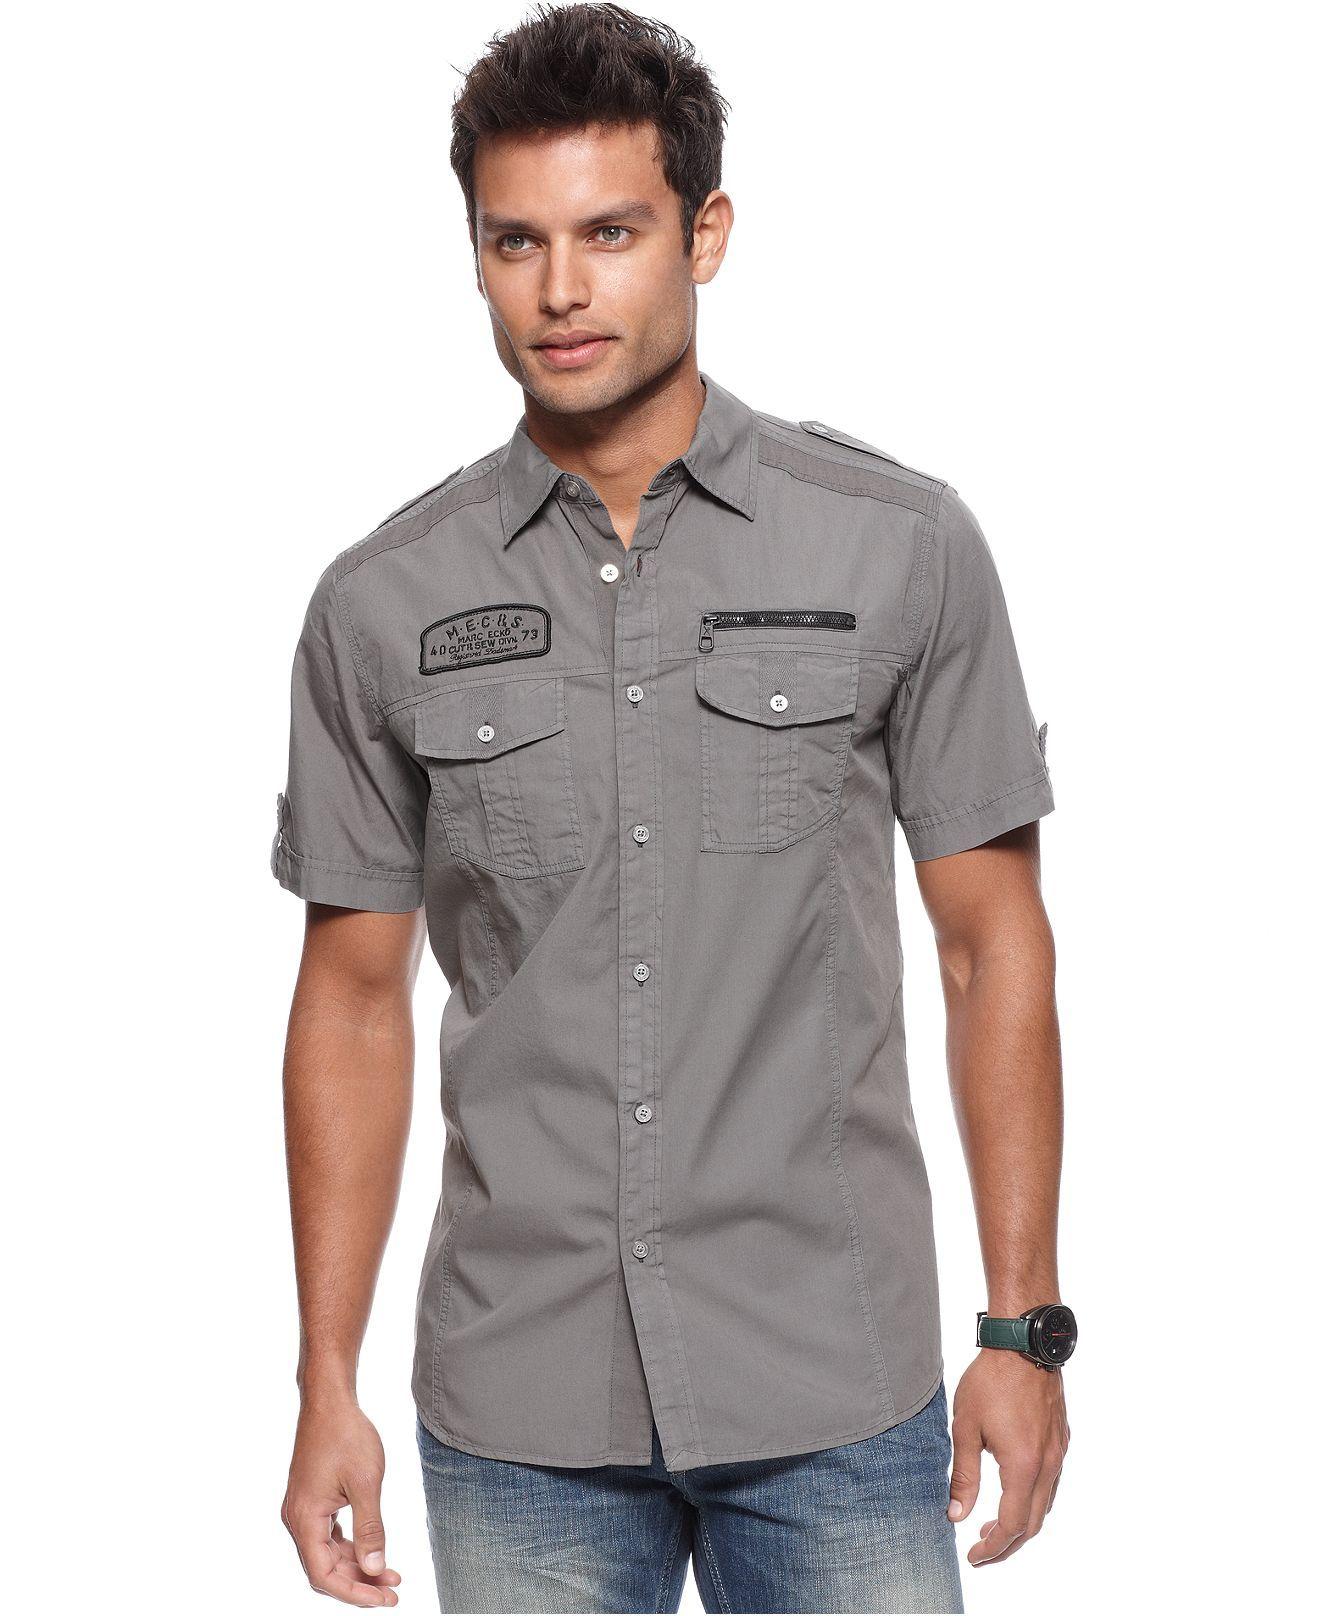 macys marc ecko cut amp sew shirt broome shirt